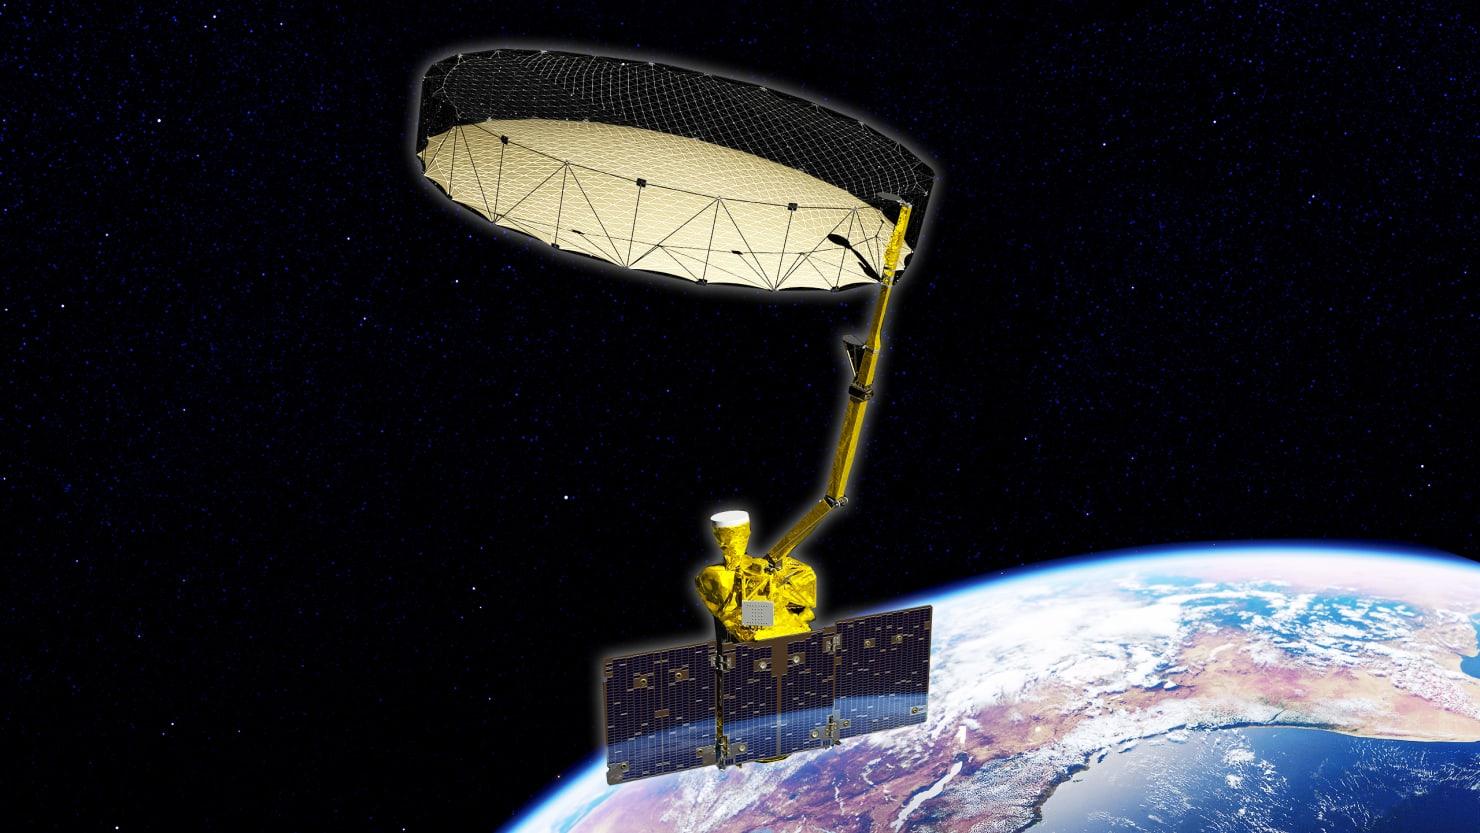 illustration of satellite over earth smap Soil Moisture Active Passive usda NASA agriculture